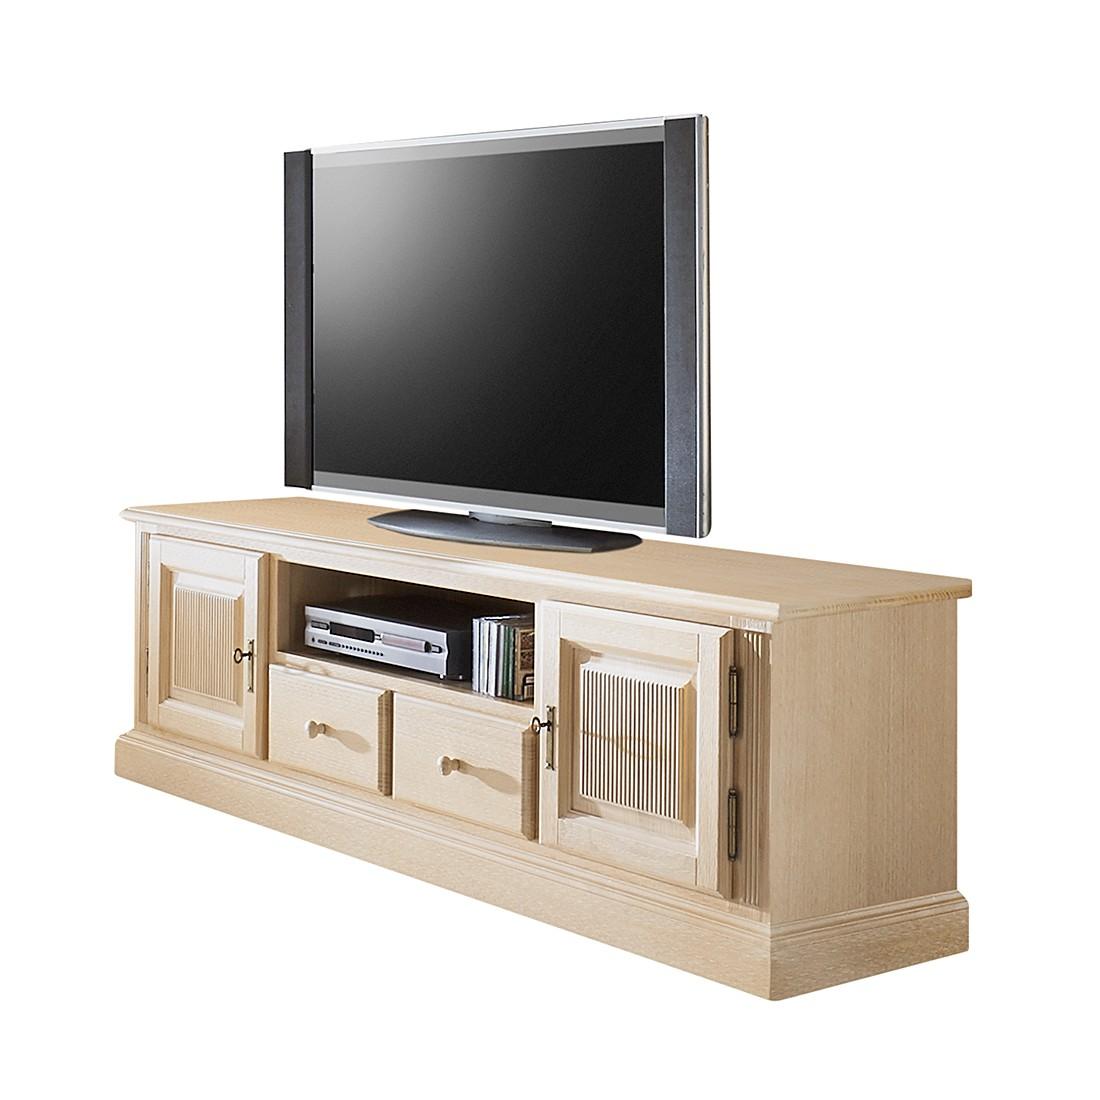 home24 TV Lowboard Breddin II | Wohnzimmer > TV-HiFi-Möbel > TV-Lowboards